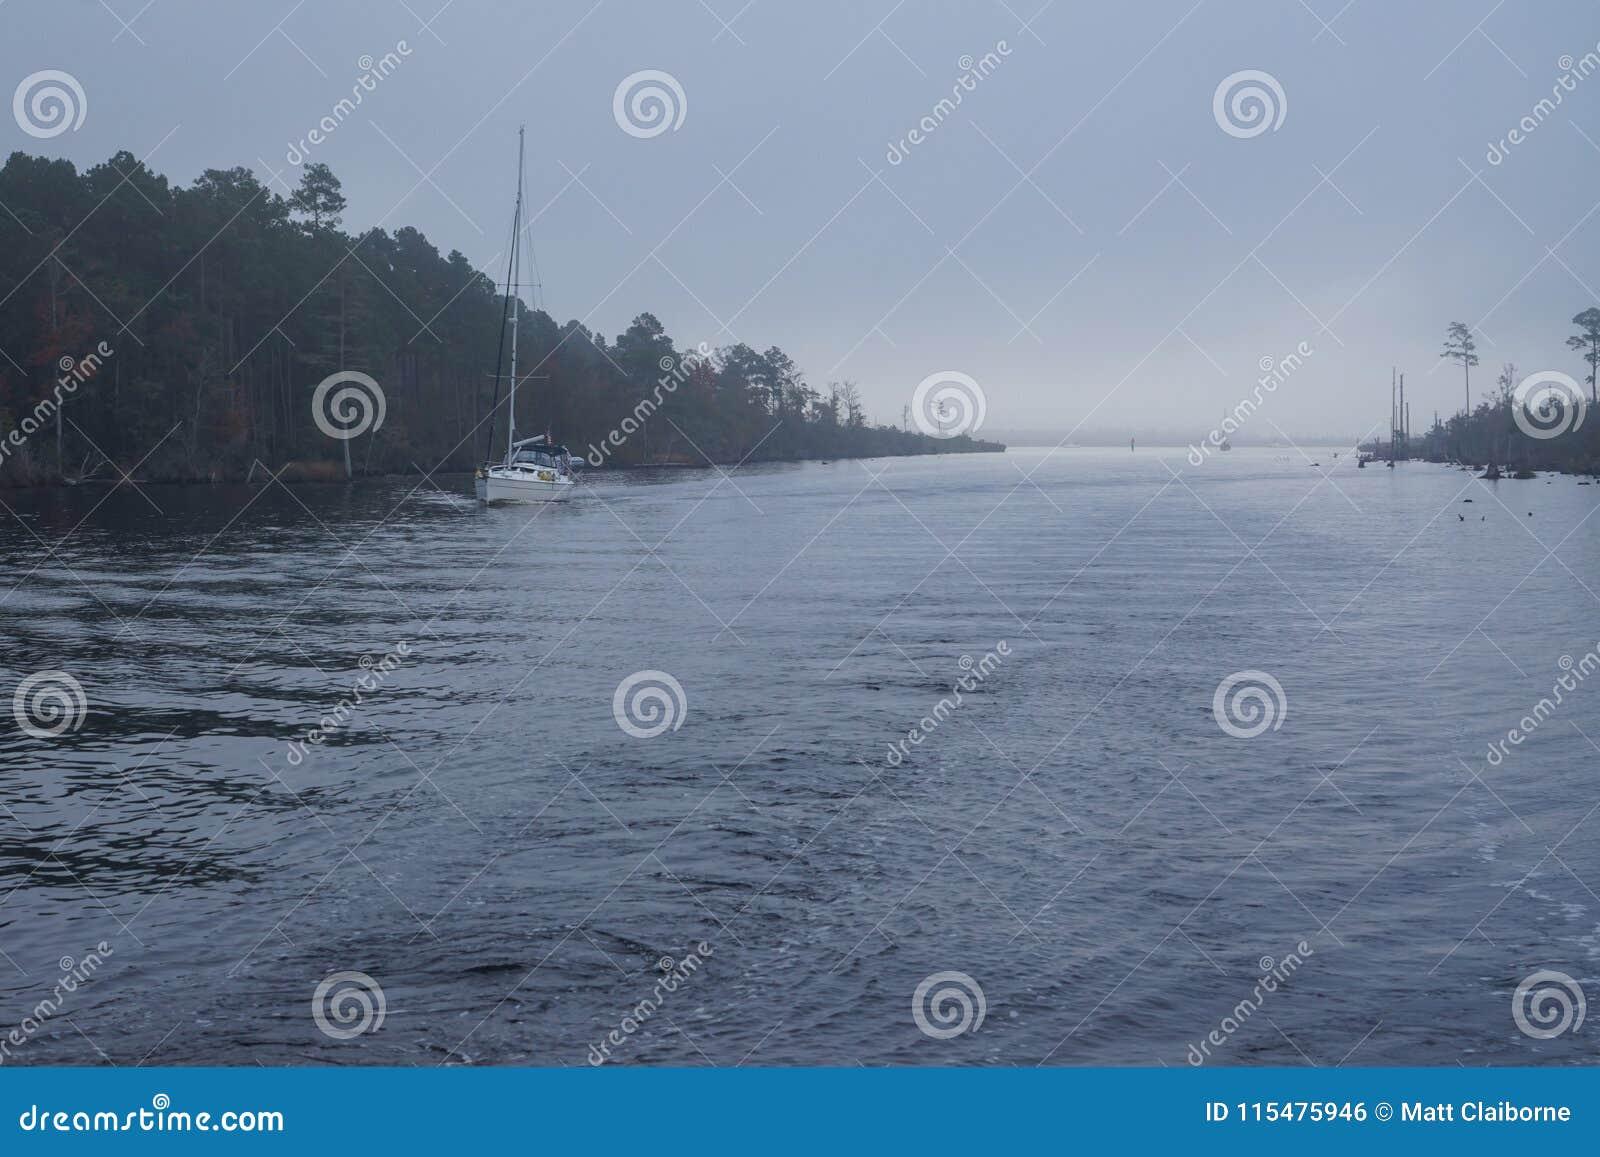 Fog On Atlantic Intracoastal Waterway Stock Photo - Image of sailing